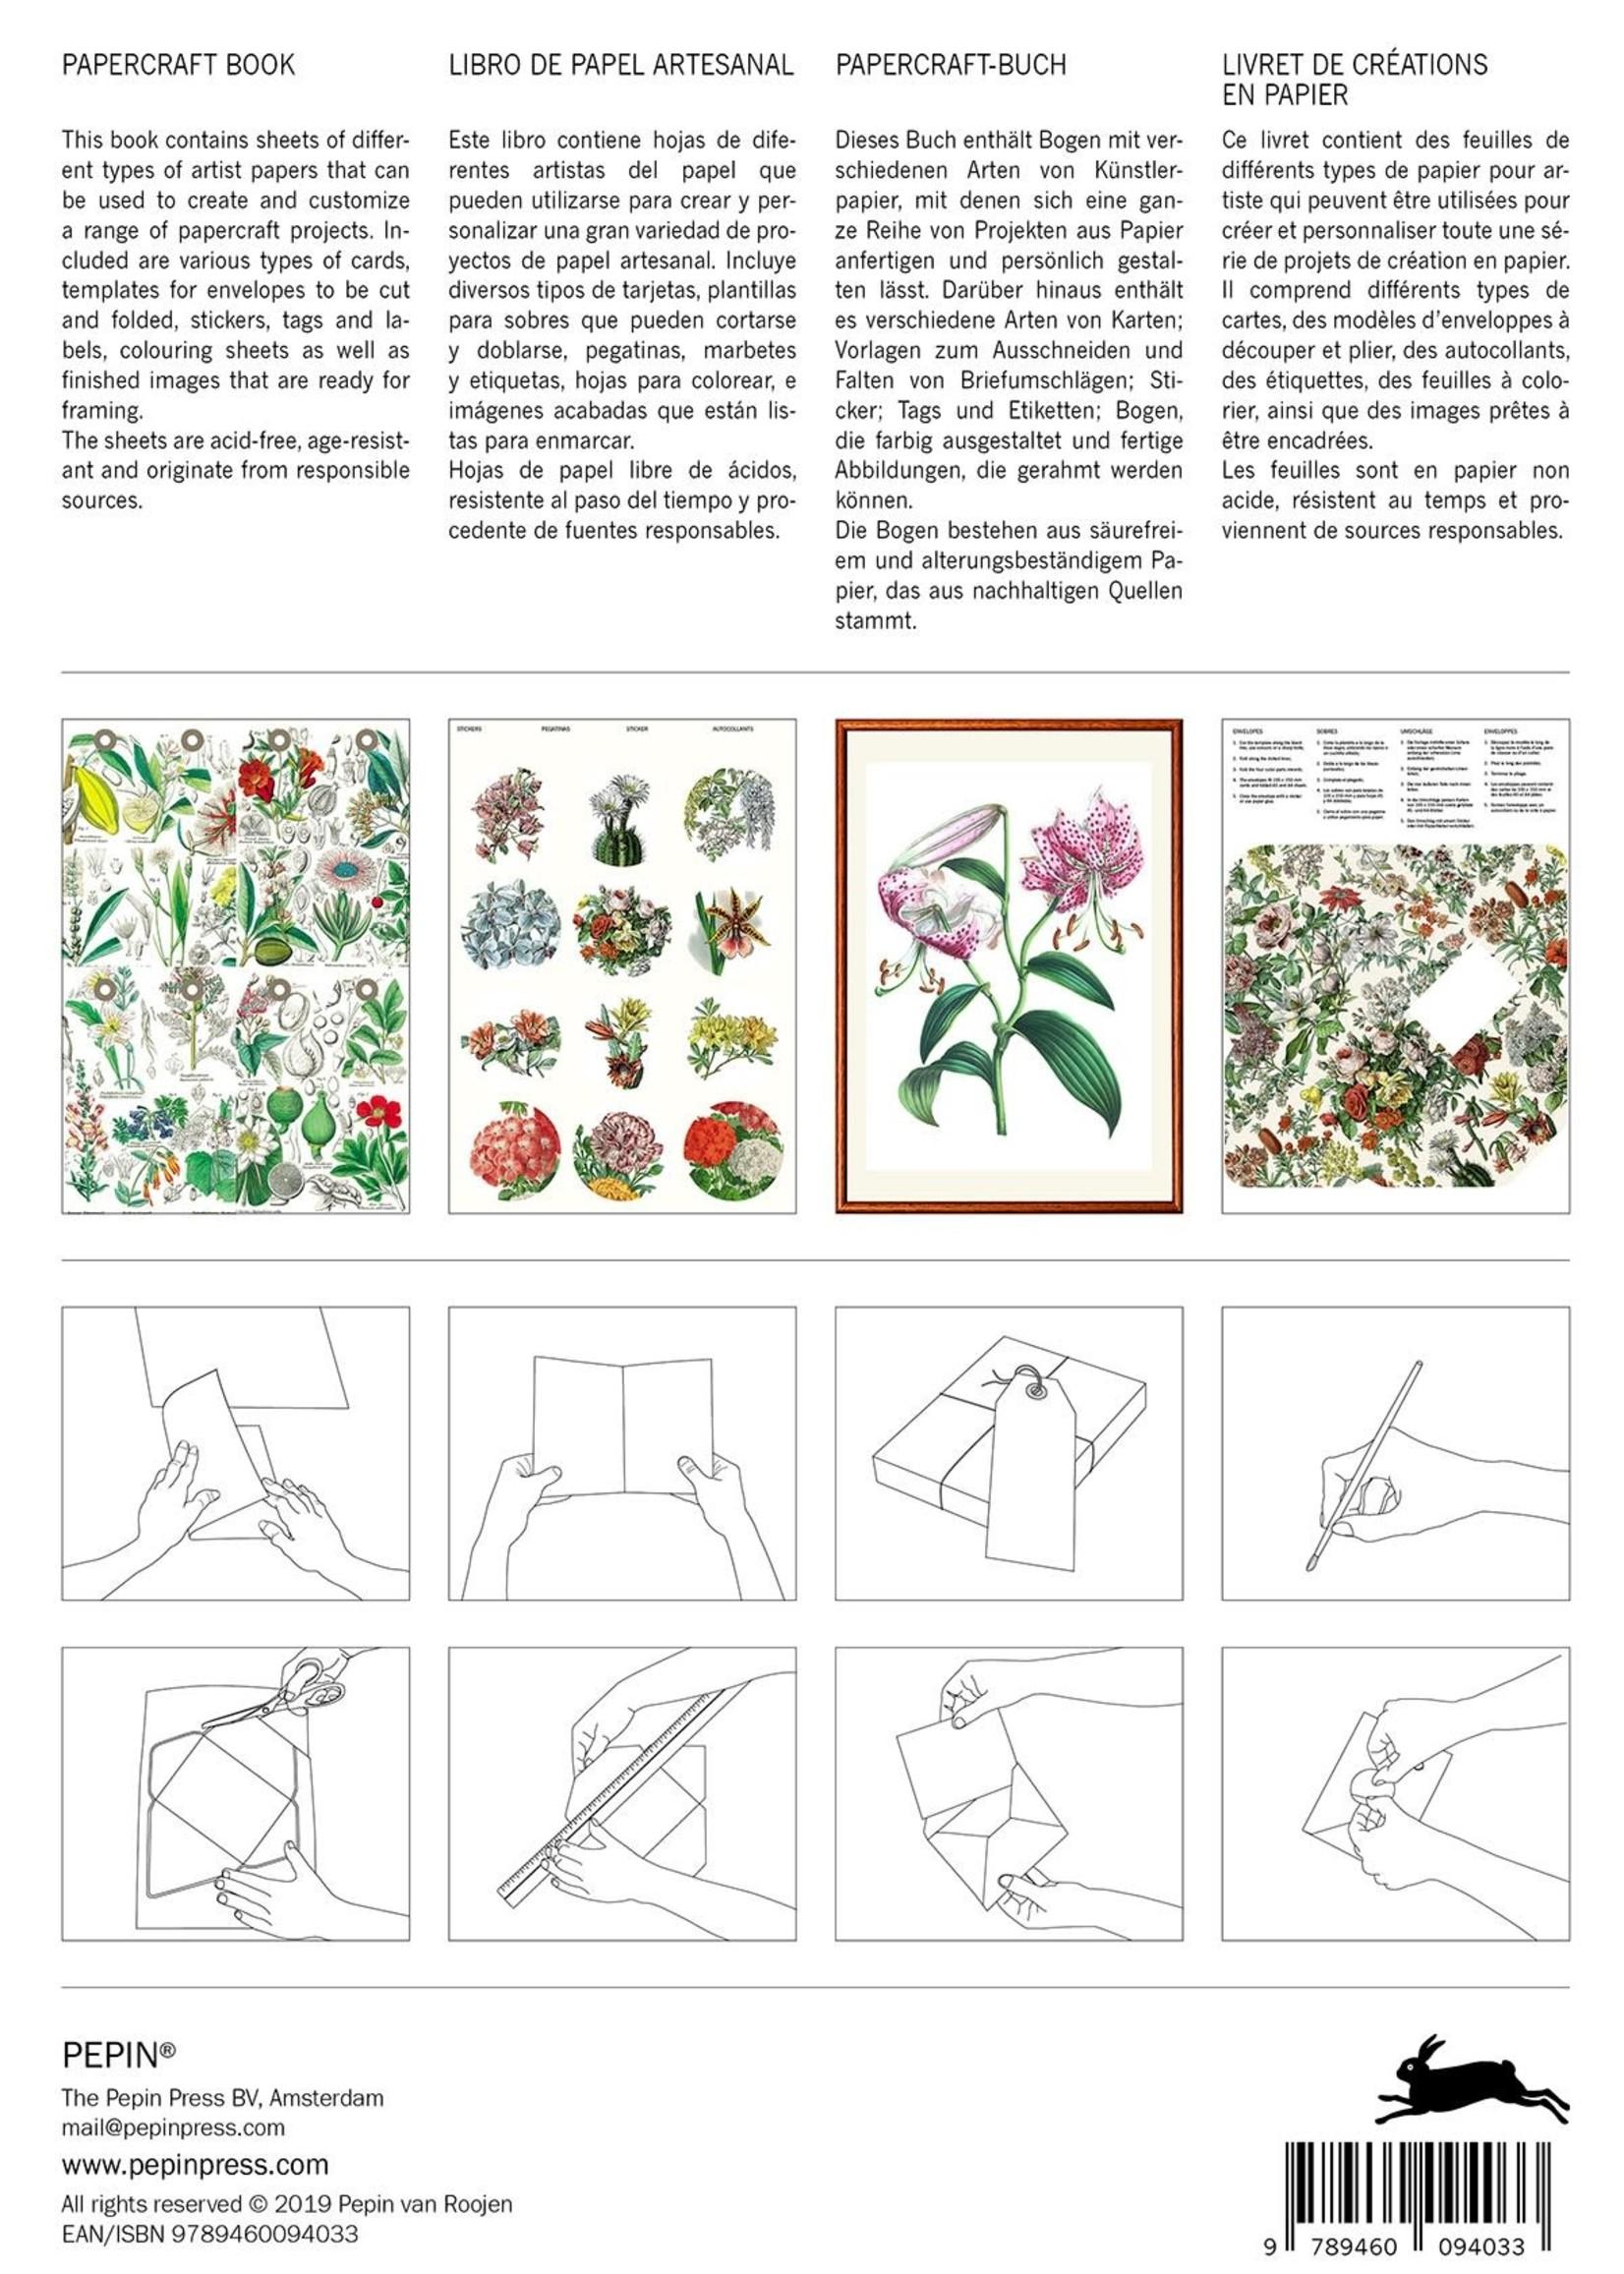 Pepin Press Papercraft Boek FLOWERS